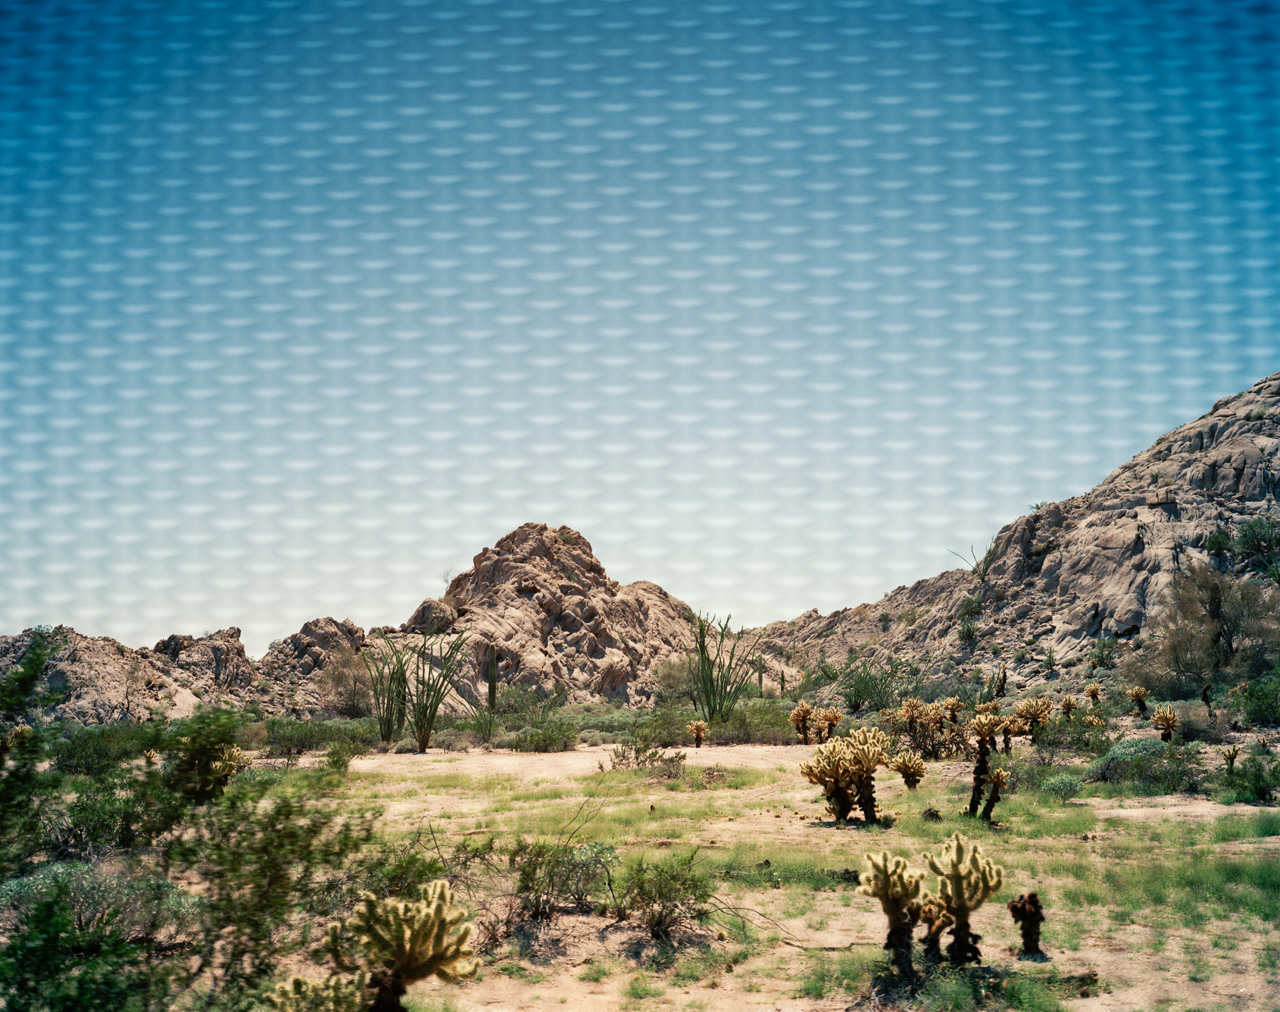 Looking Through, U.S.-Mexico Border Fence, Near Tinajas Altas, Arizona